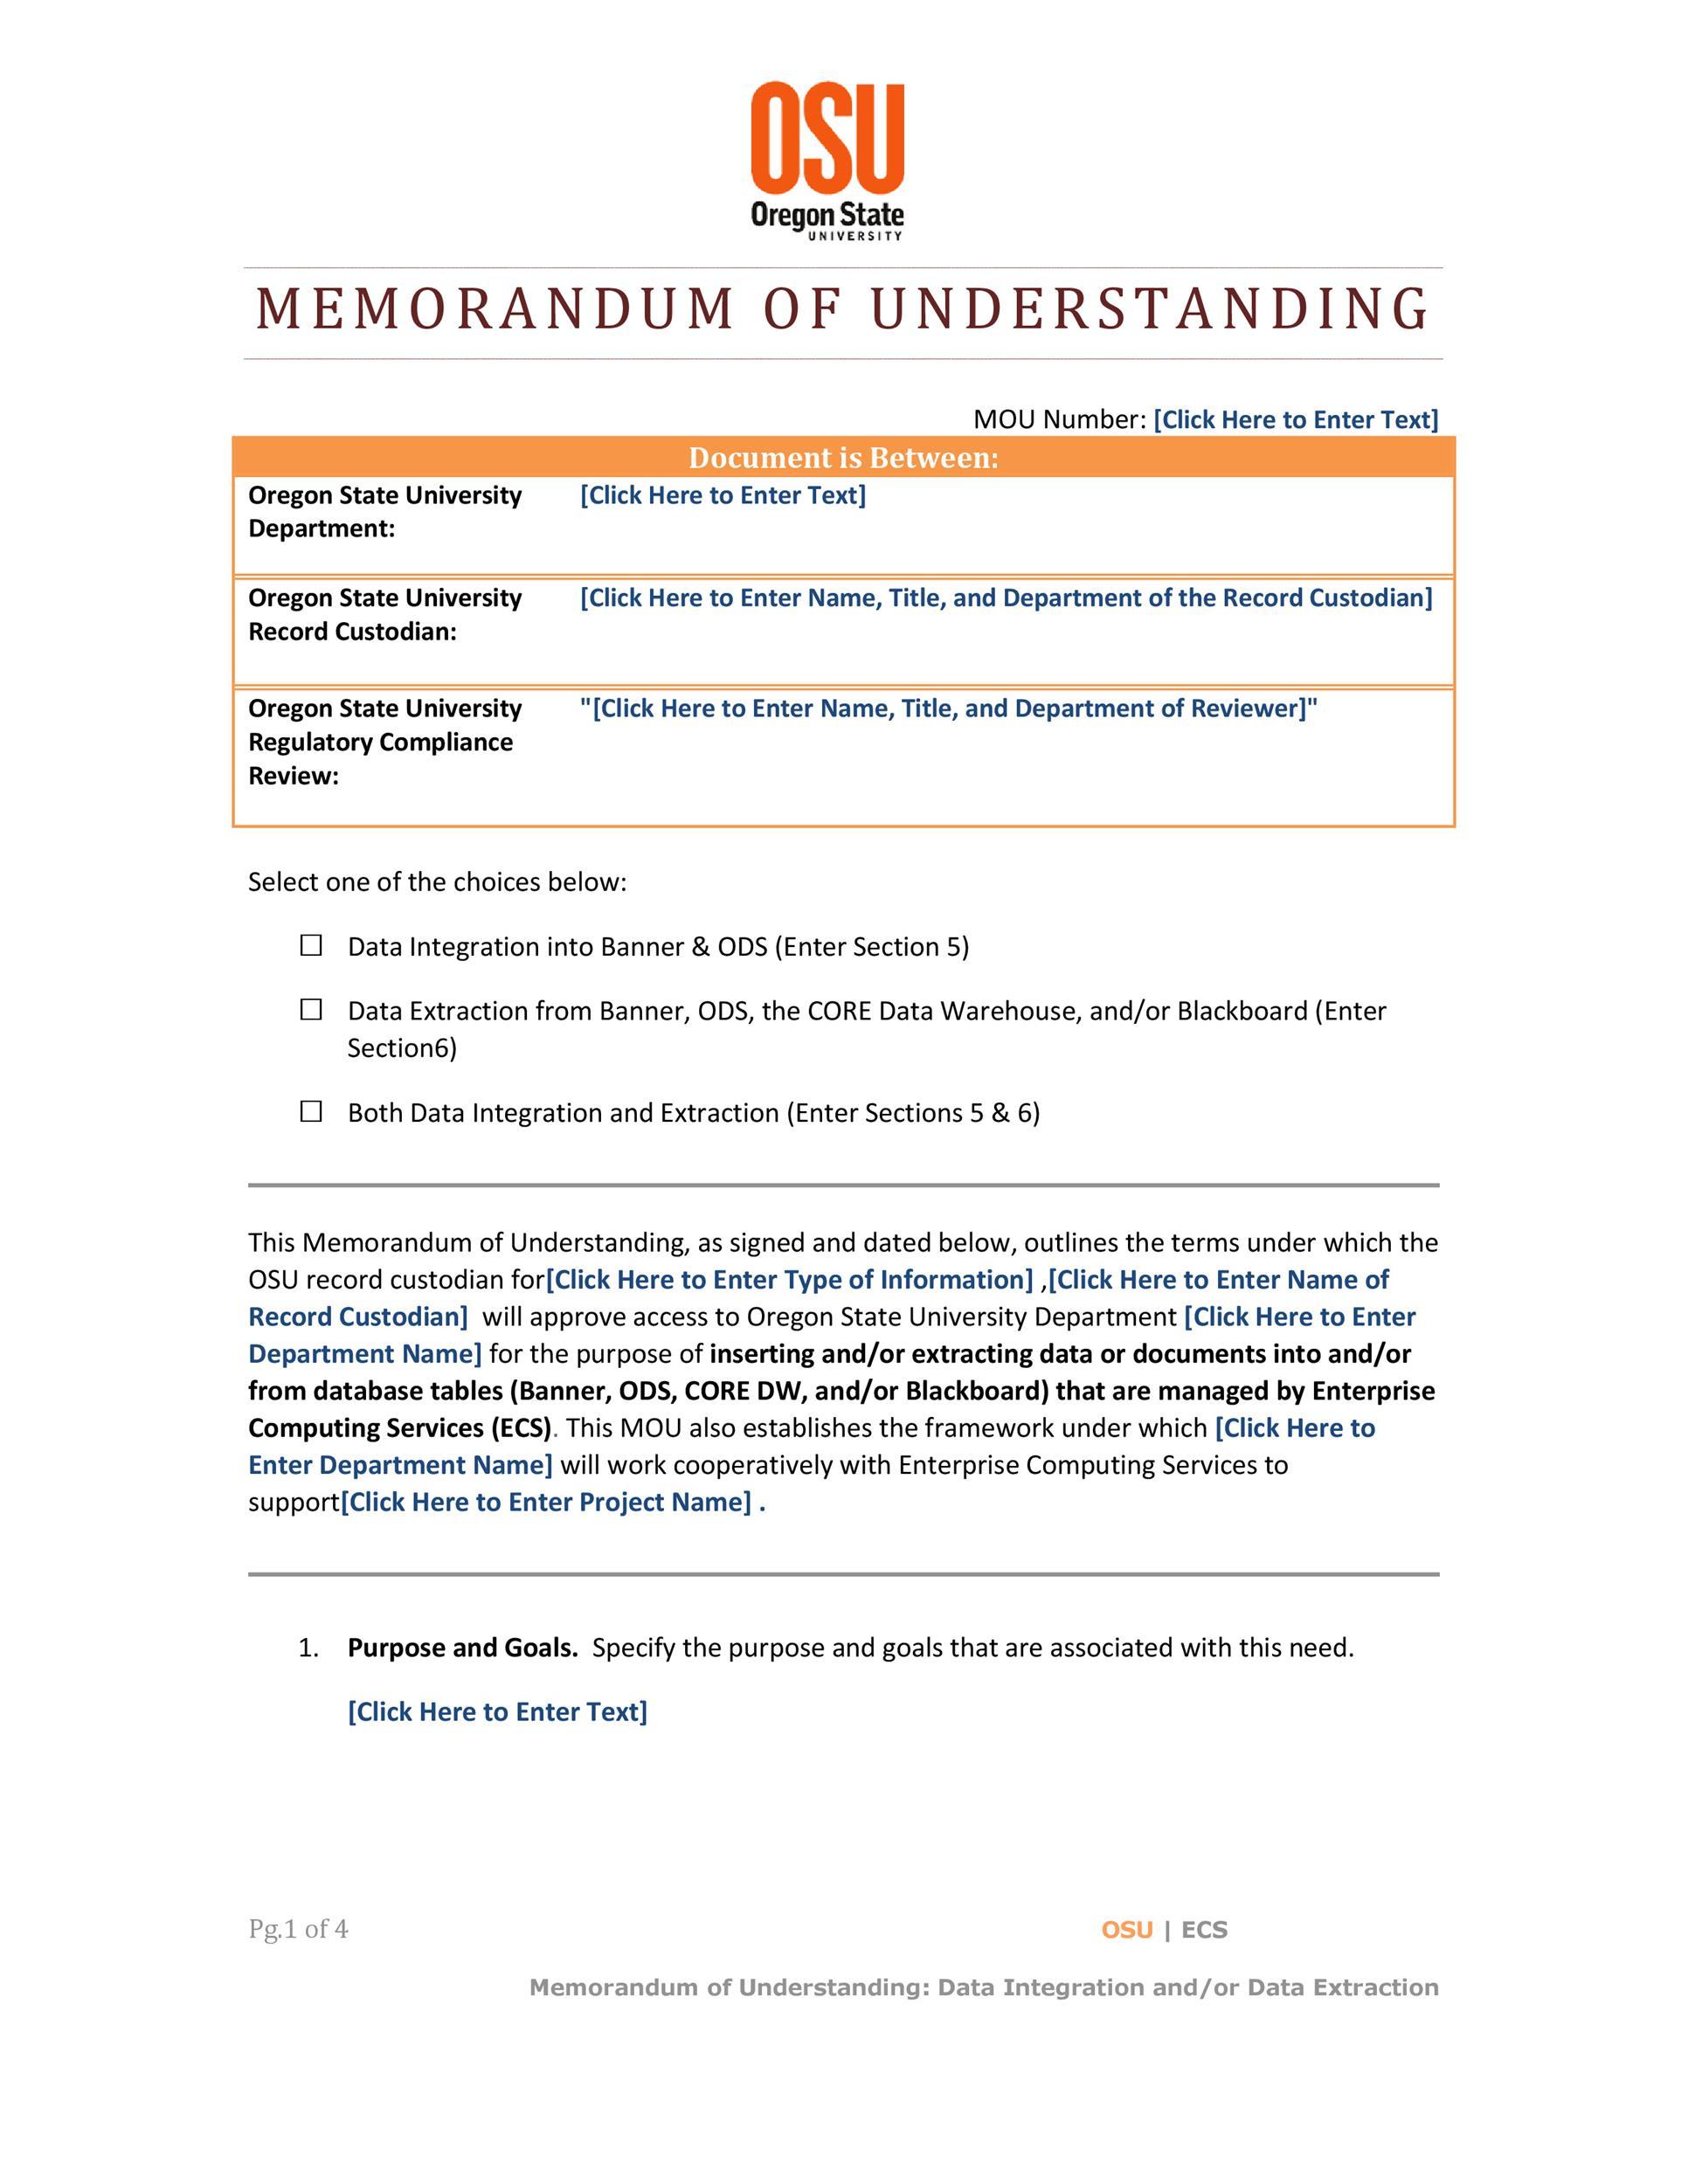 Free Memorandum of Understanding Template 22